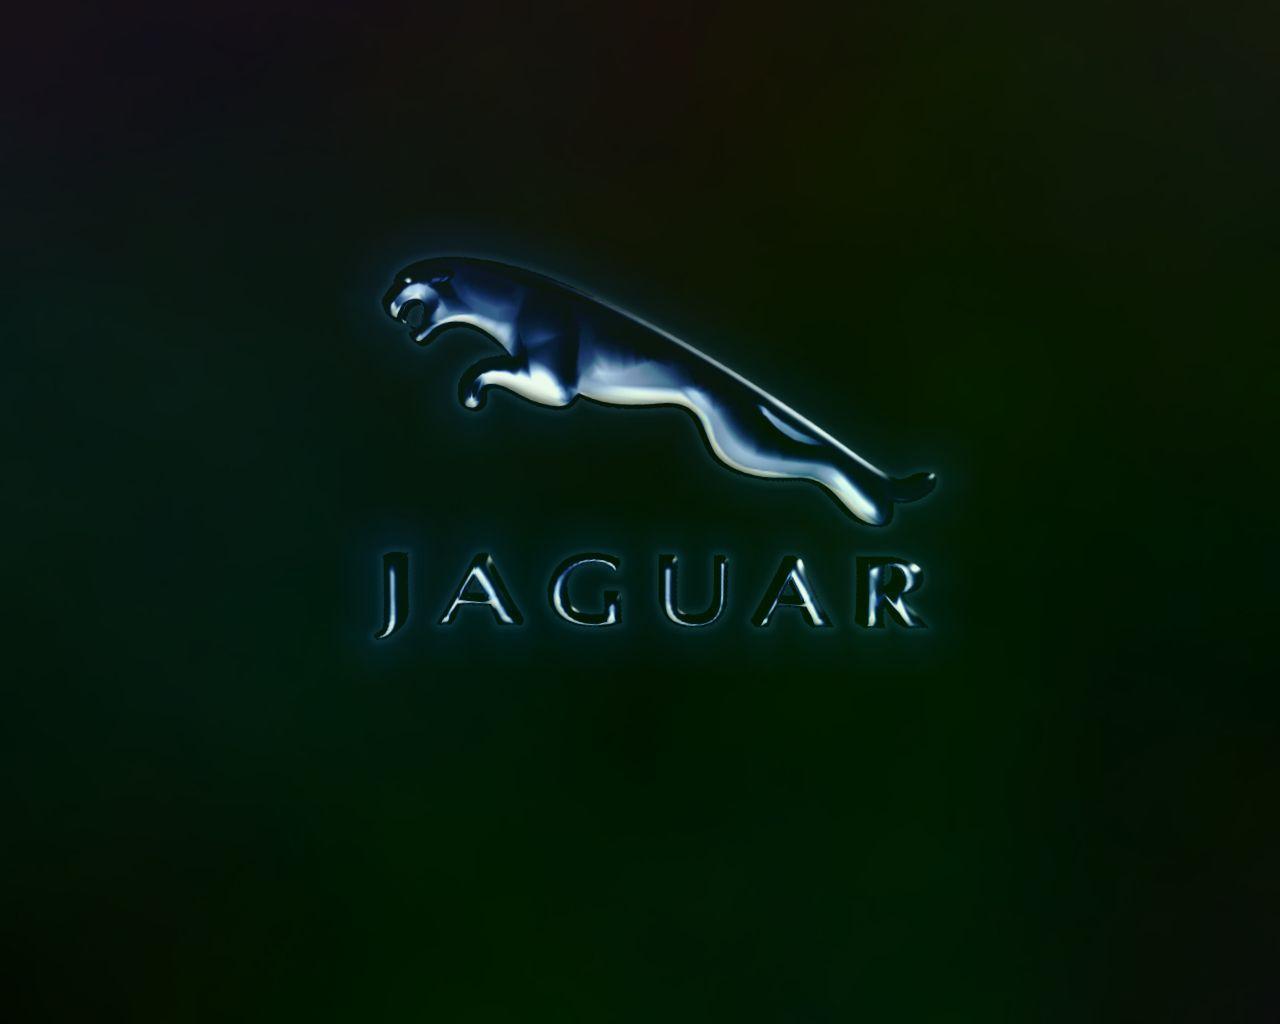 Jaguar Logo Wallpapers - Wallpaper Cave